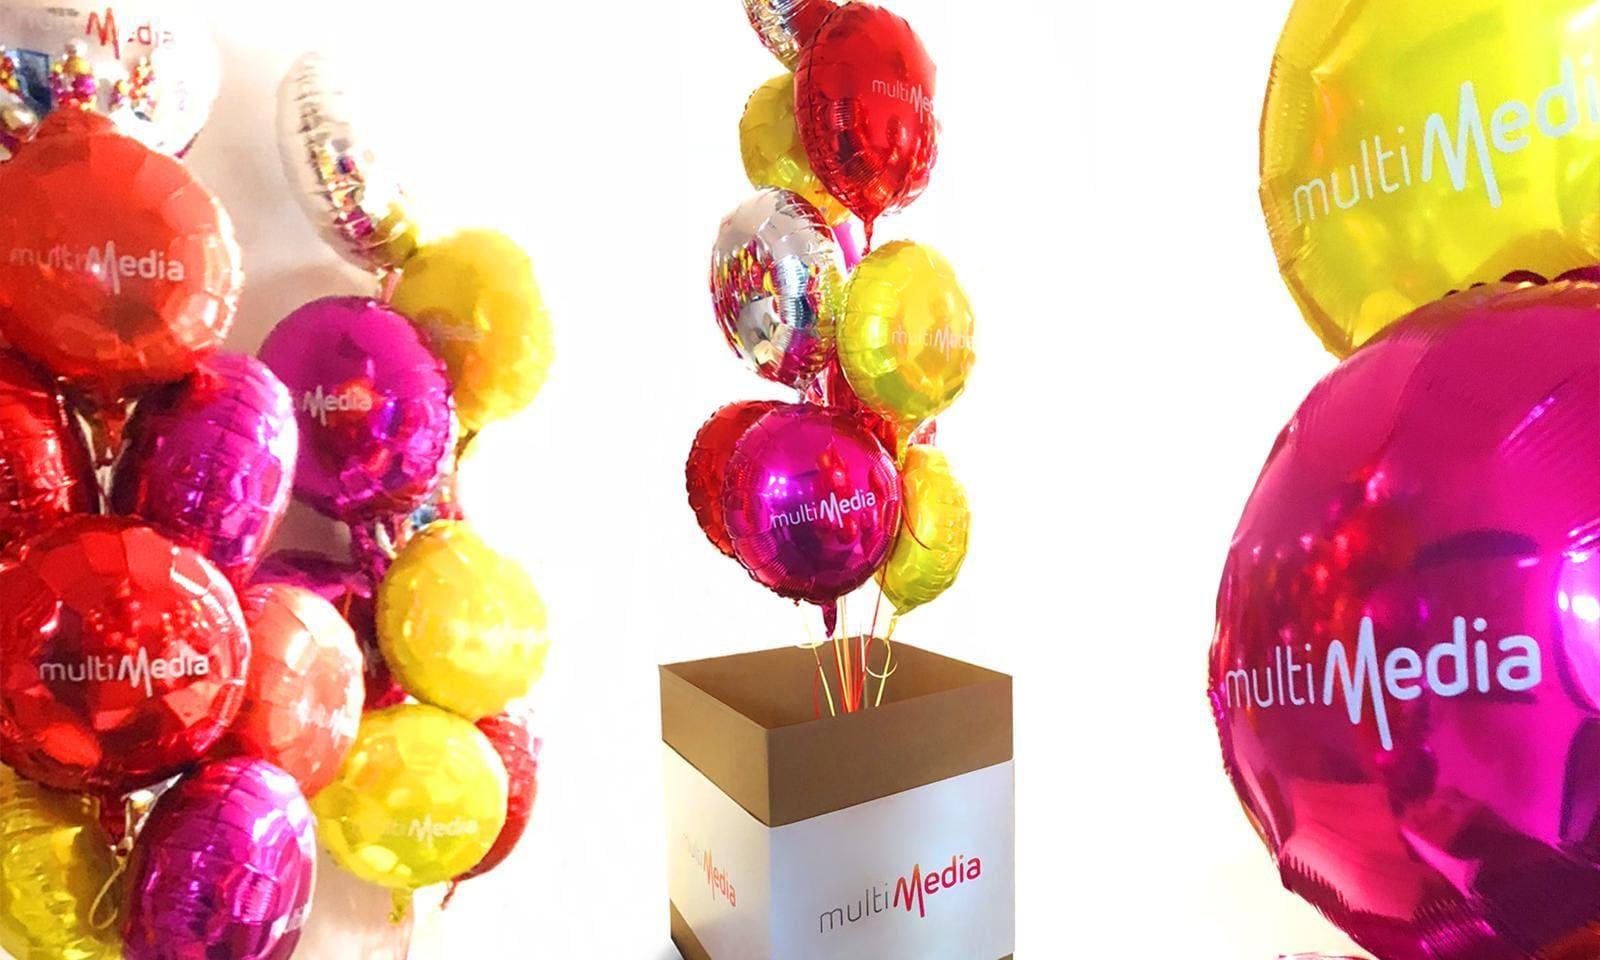 Multimedia różnokolorowe balony